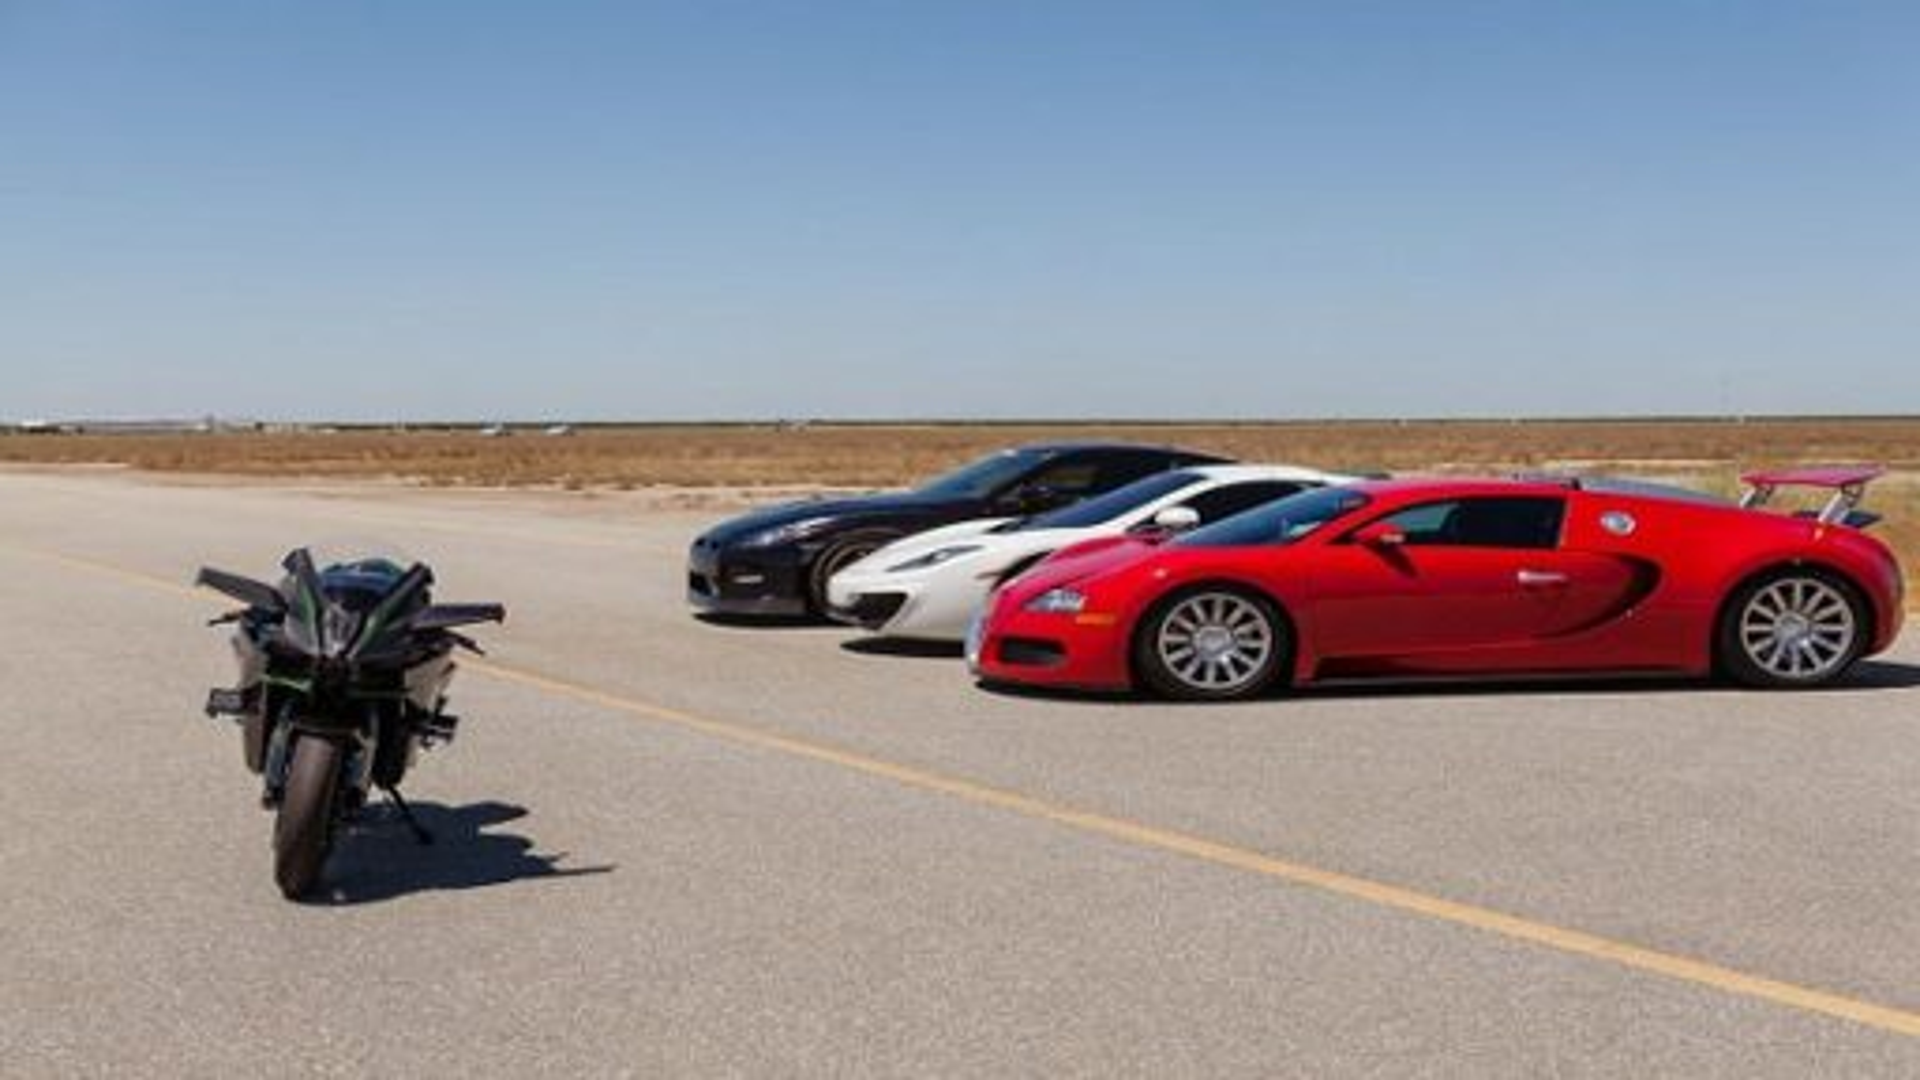 رقابت عجیب بوگاتى ویرون، مکلارن و نیسان مقابل موتورسیکلت کاوازاکى | فیلم